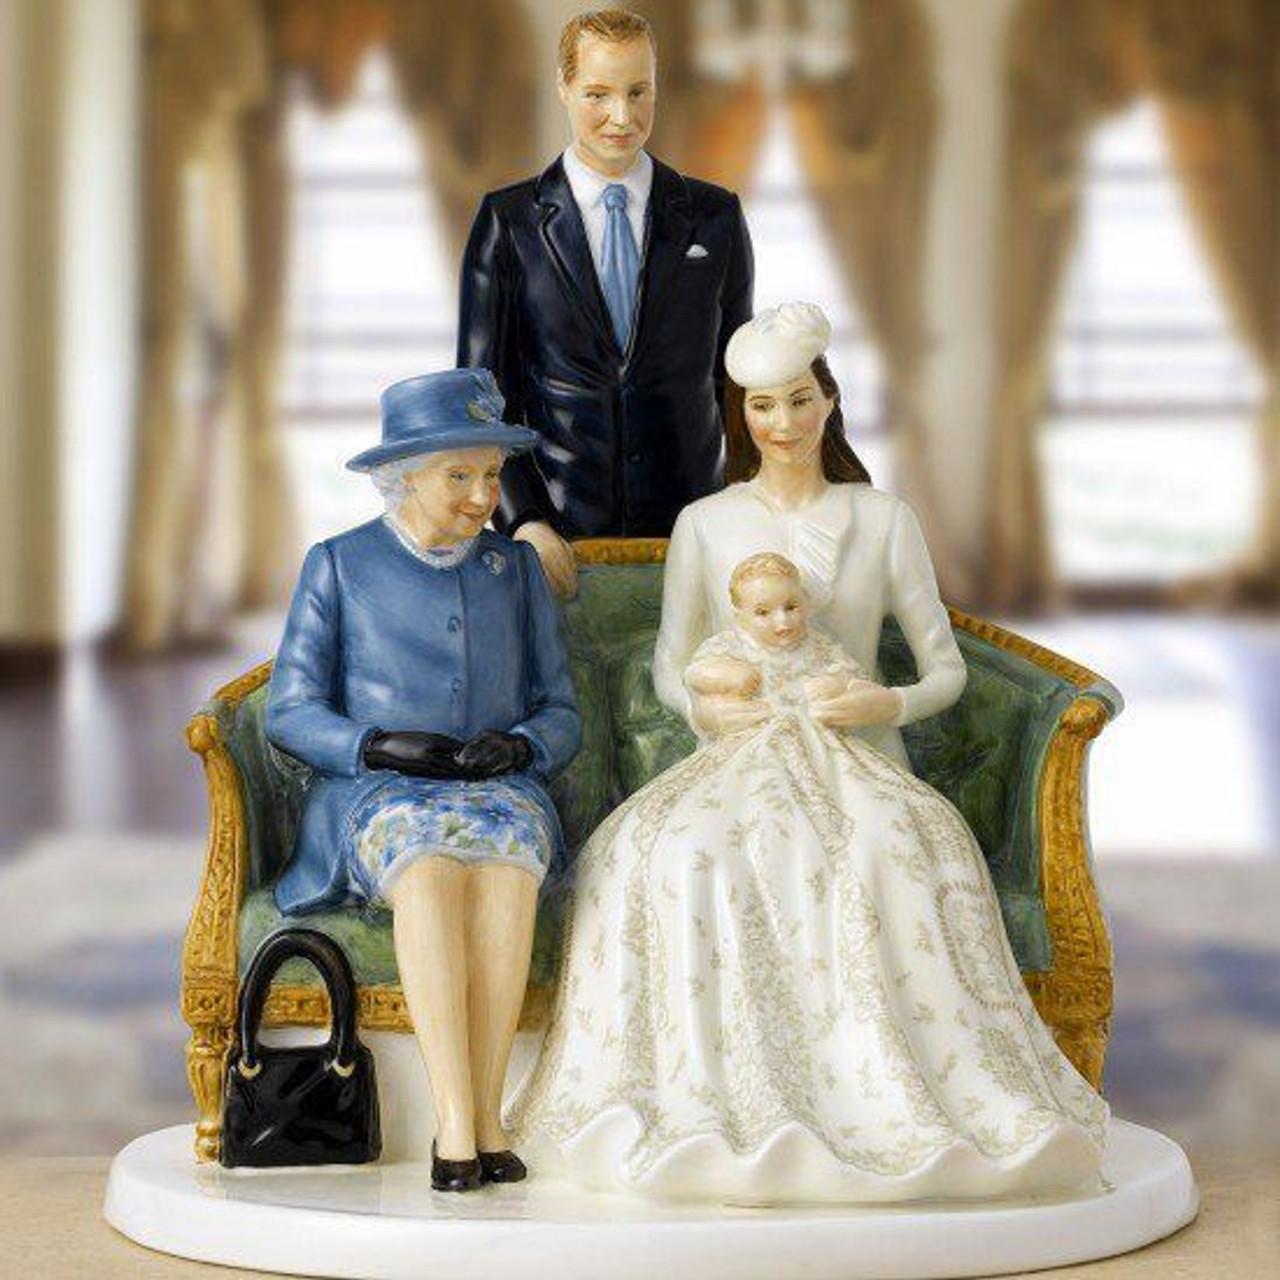 Royal Doulton Royal Commemoratives A Royal Christening Figurine 22cm